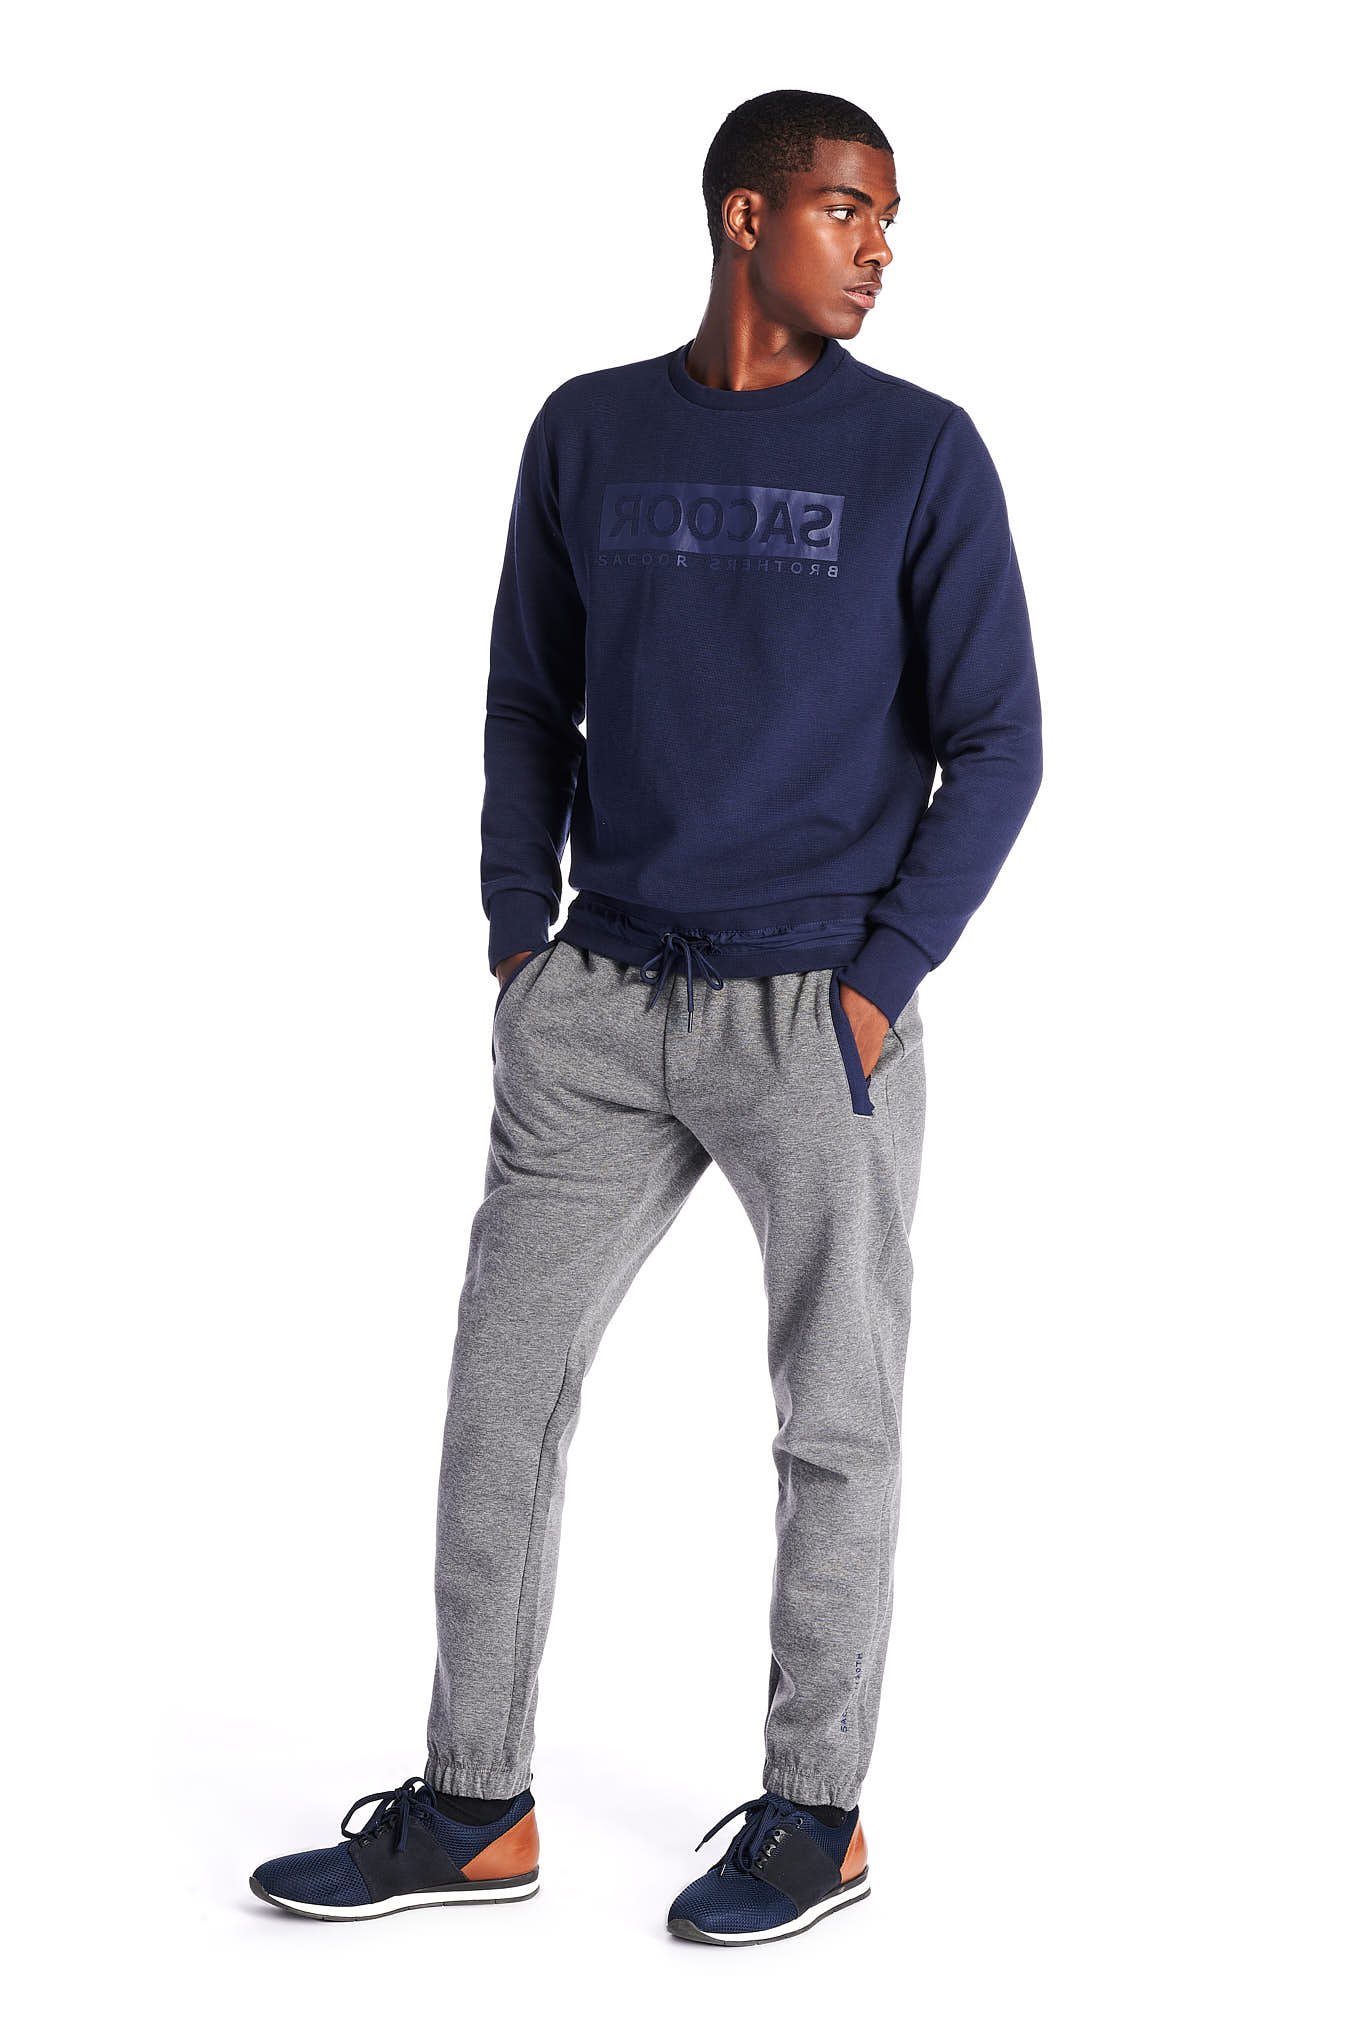 Sweatshirt Azul Escuro Sport Homem